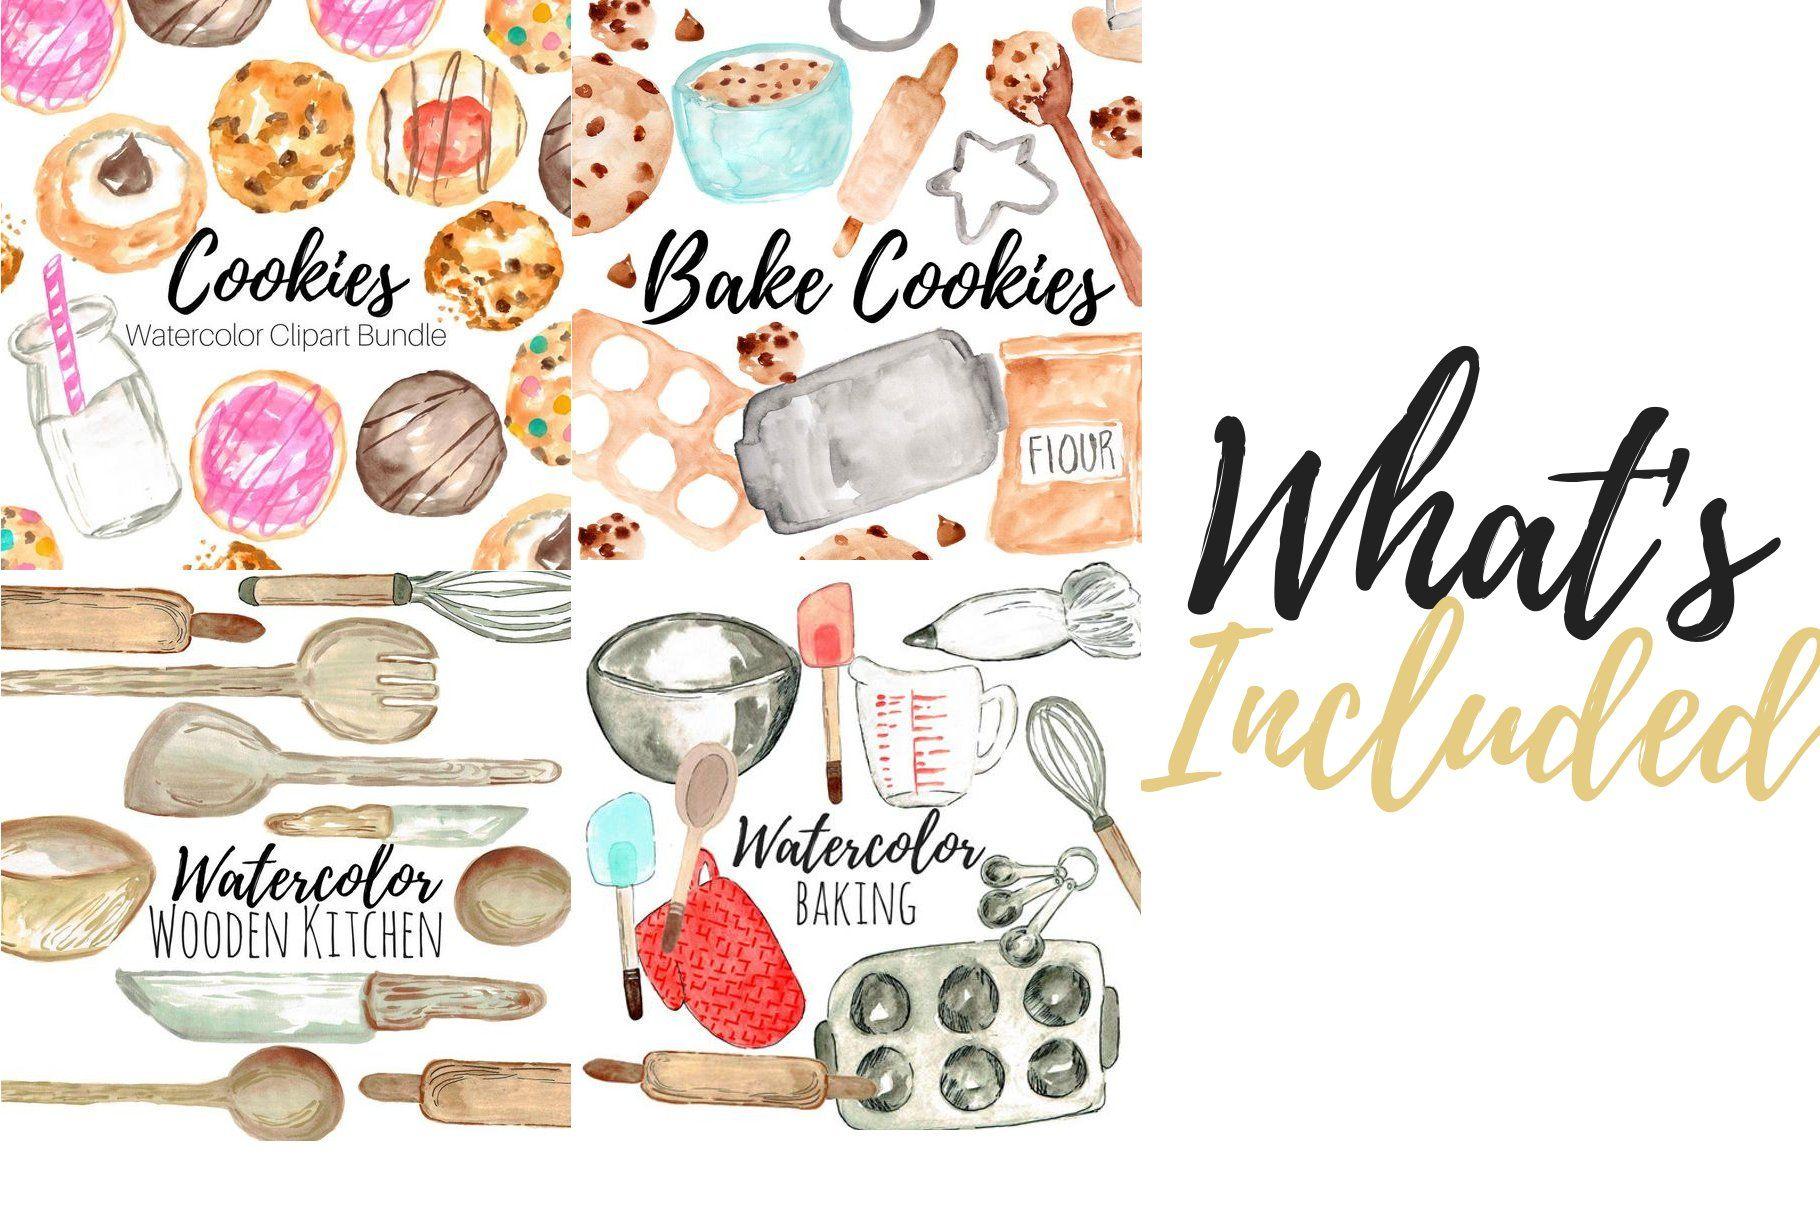 31 Watercolor Cookie Baking Clipart Watercolor Cookies Clip Art